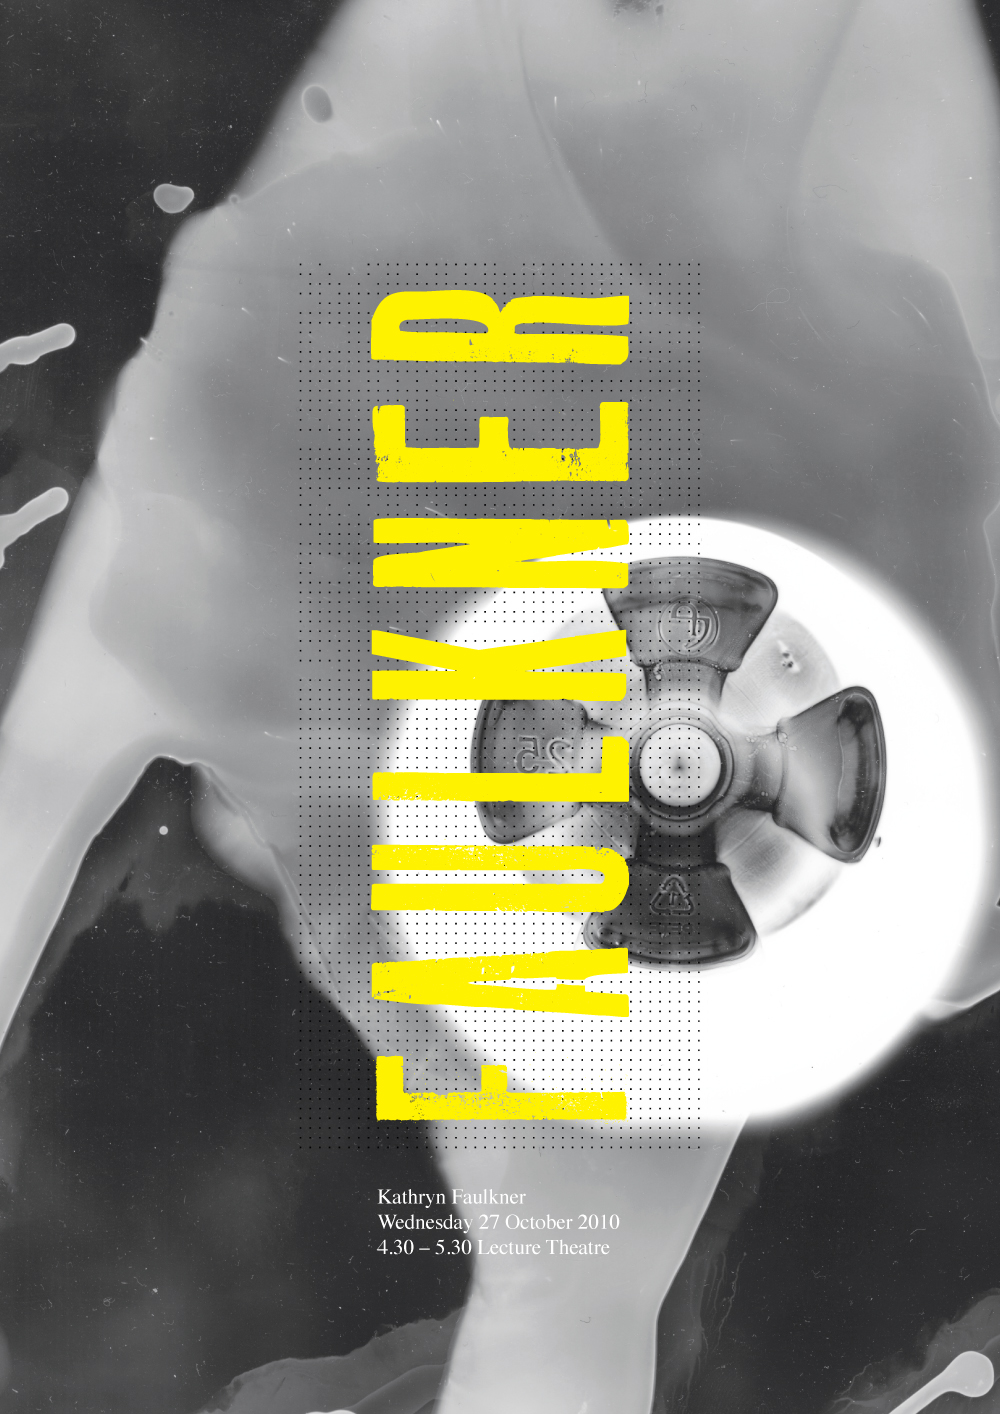 poster-kf4